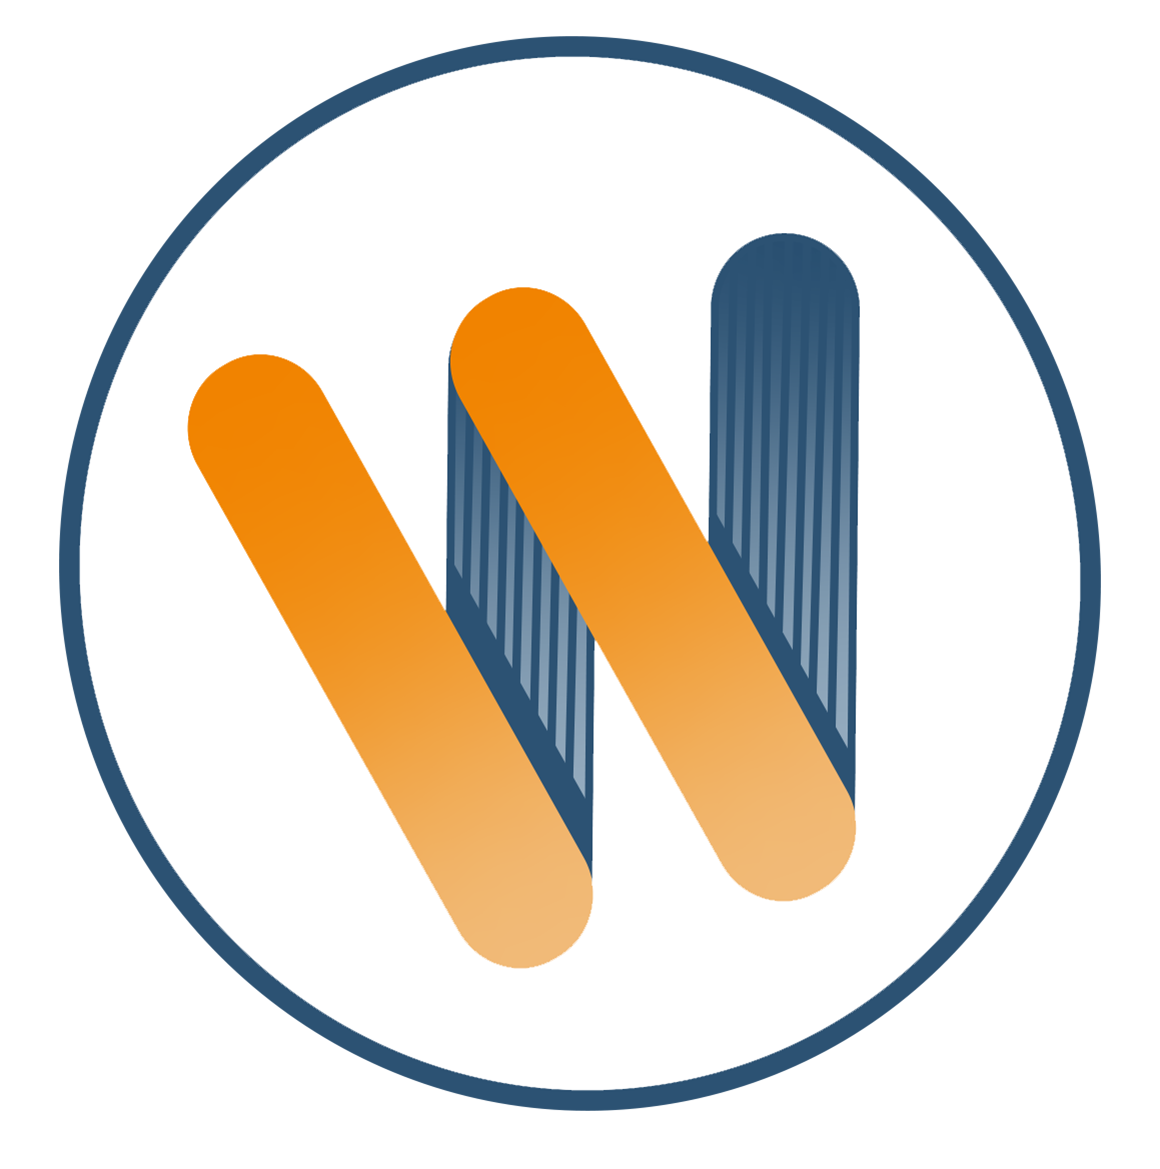 Logo vanWelie.net